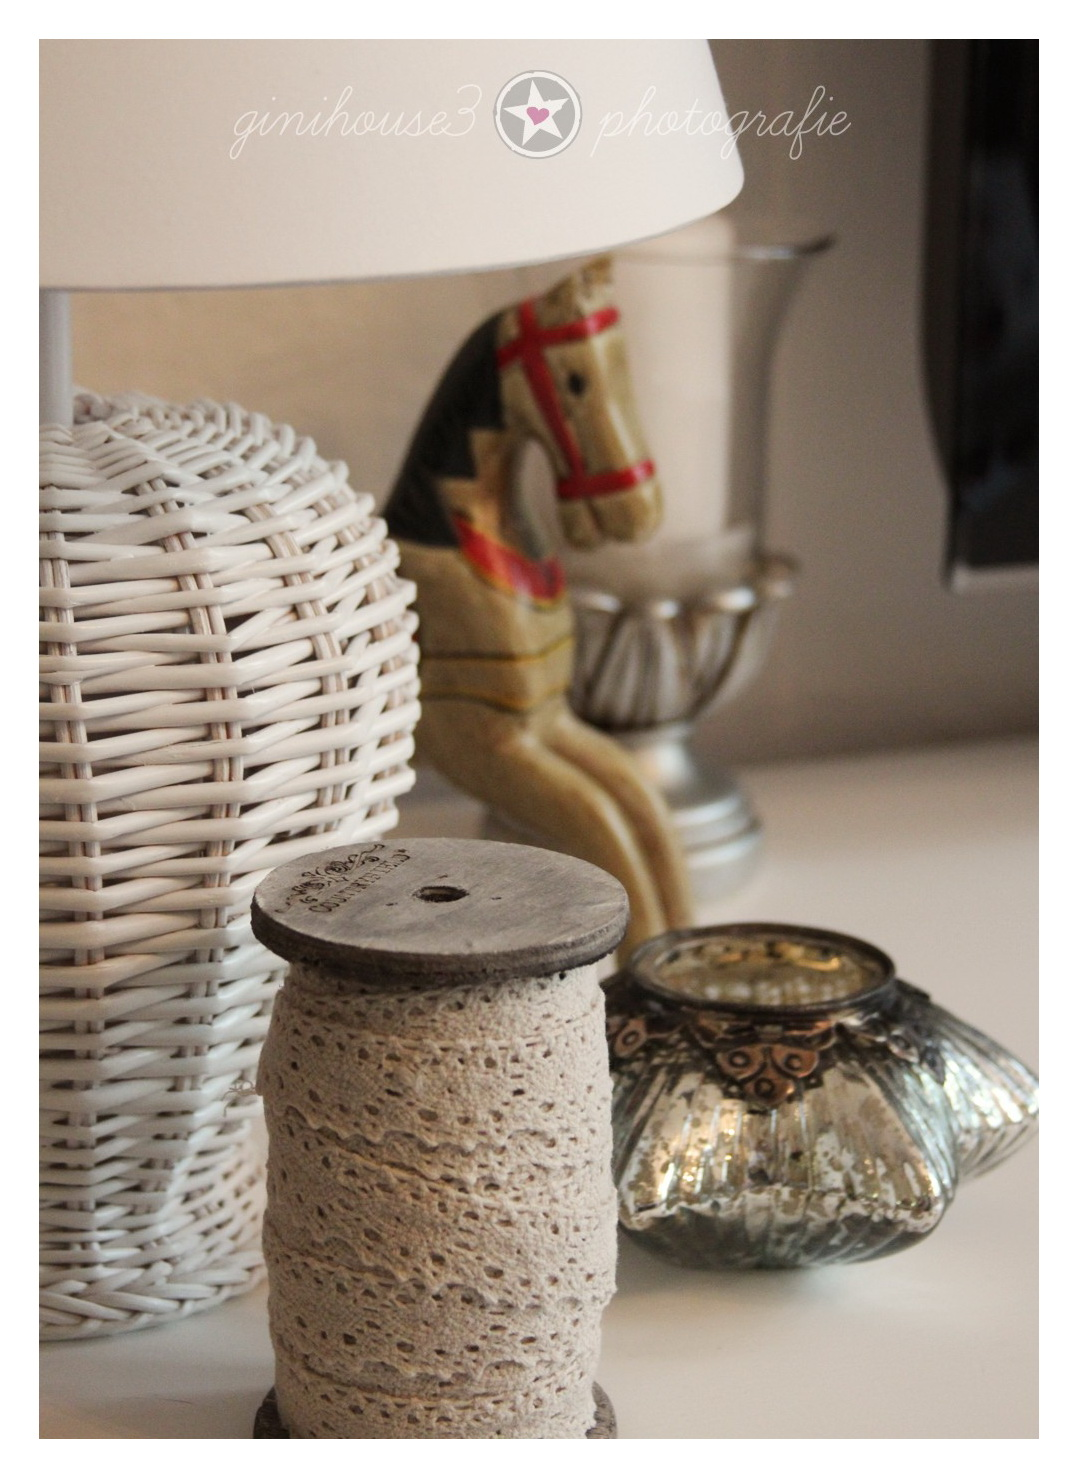 ginihouse3 sticken und design tkmaxx i it. Black Bedroom Furniture Sets. Home Design Ideas